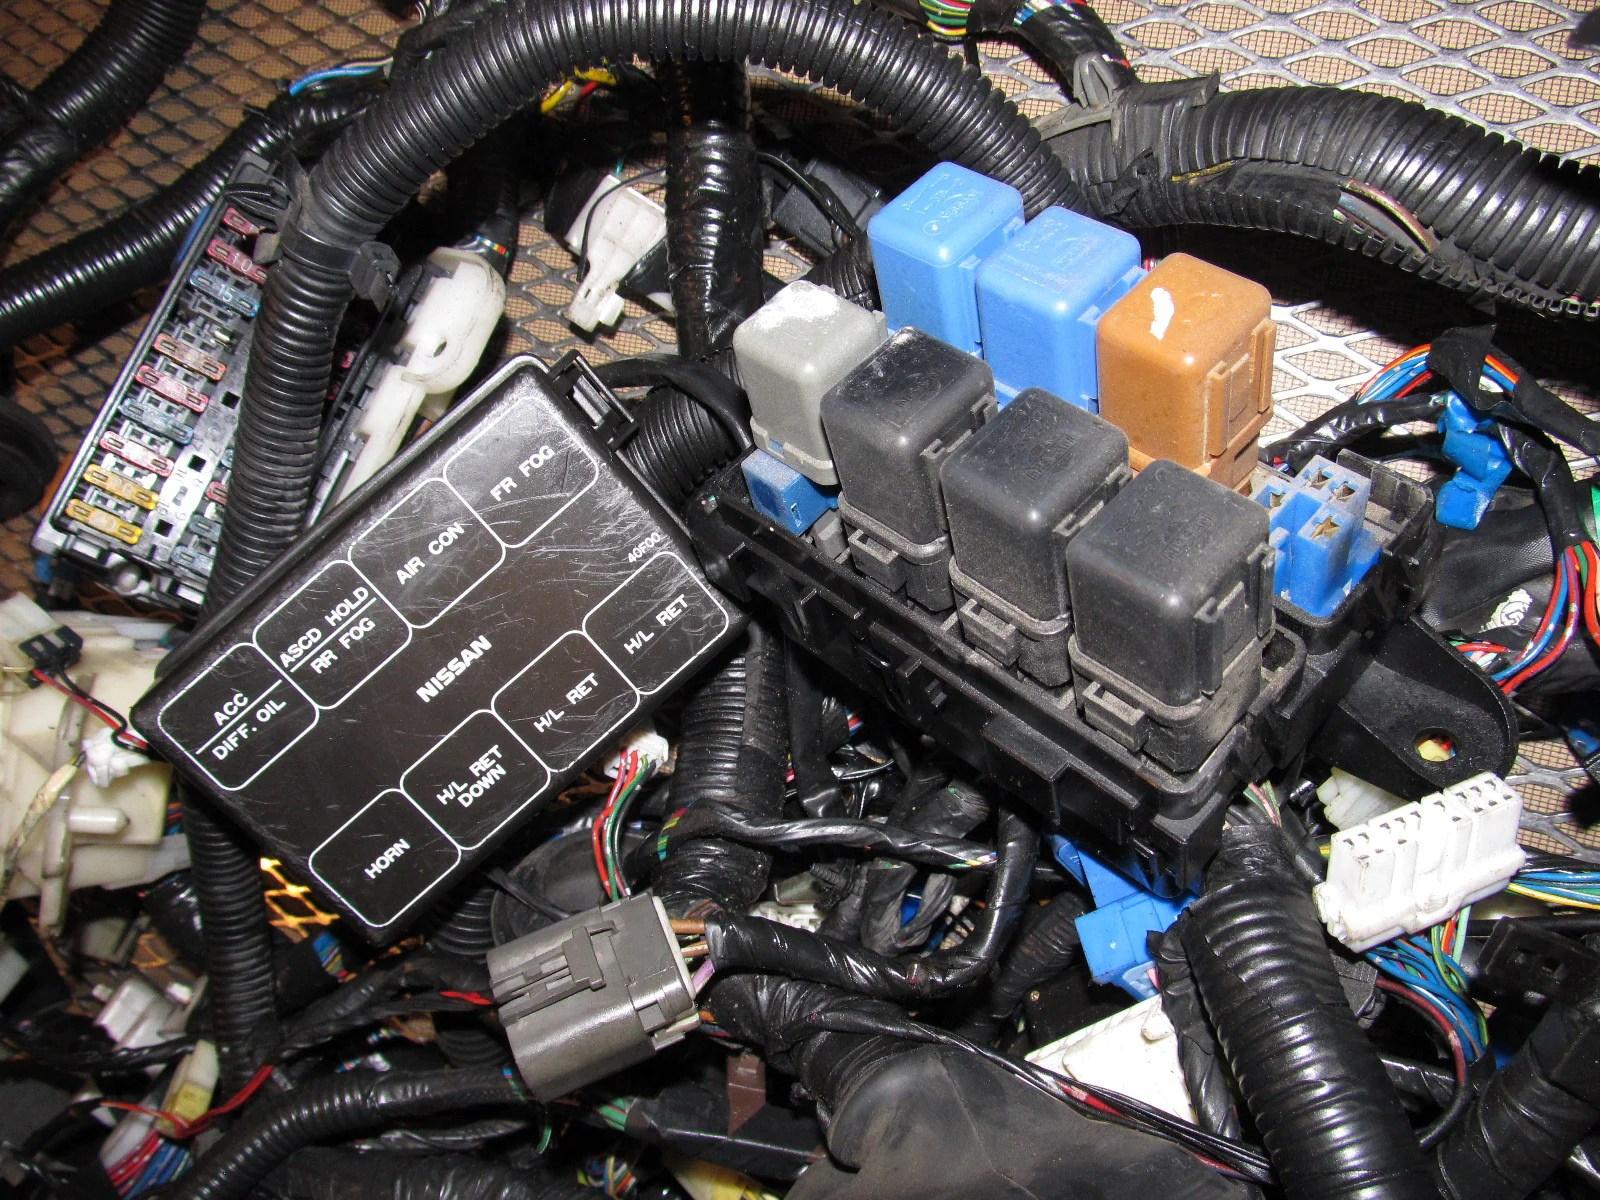 medium resolution of 90 240sx fuse box schematic wiring diagrams m3 fuse box s13 240 fuse box